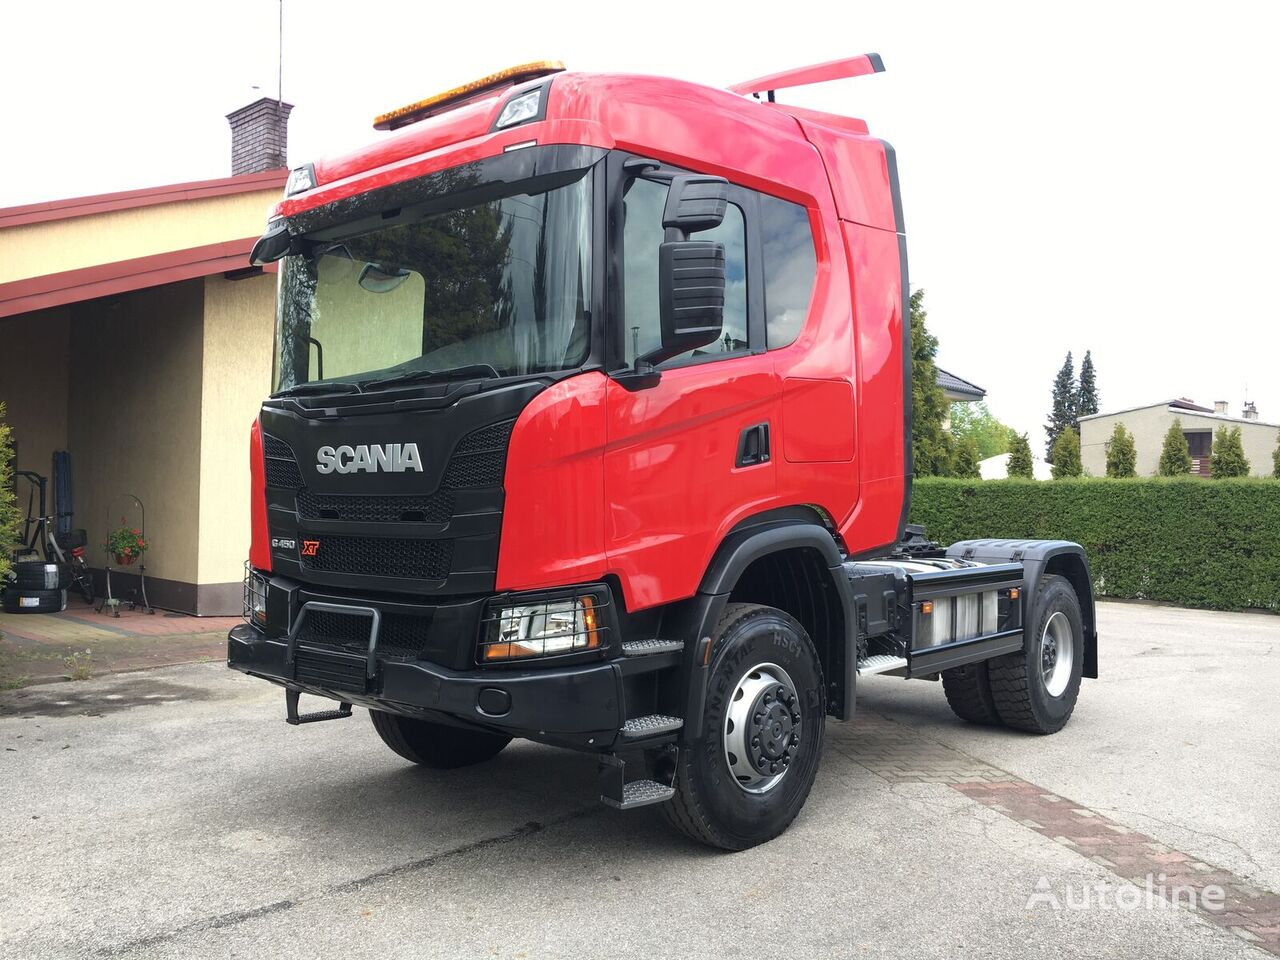 SCANIA G450 XT tractora